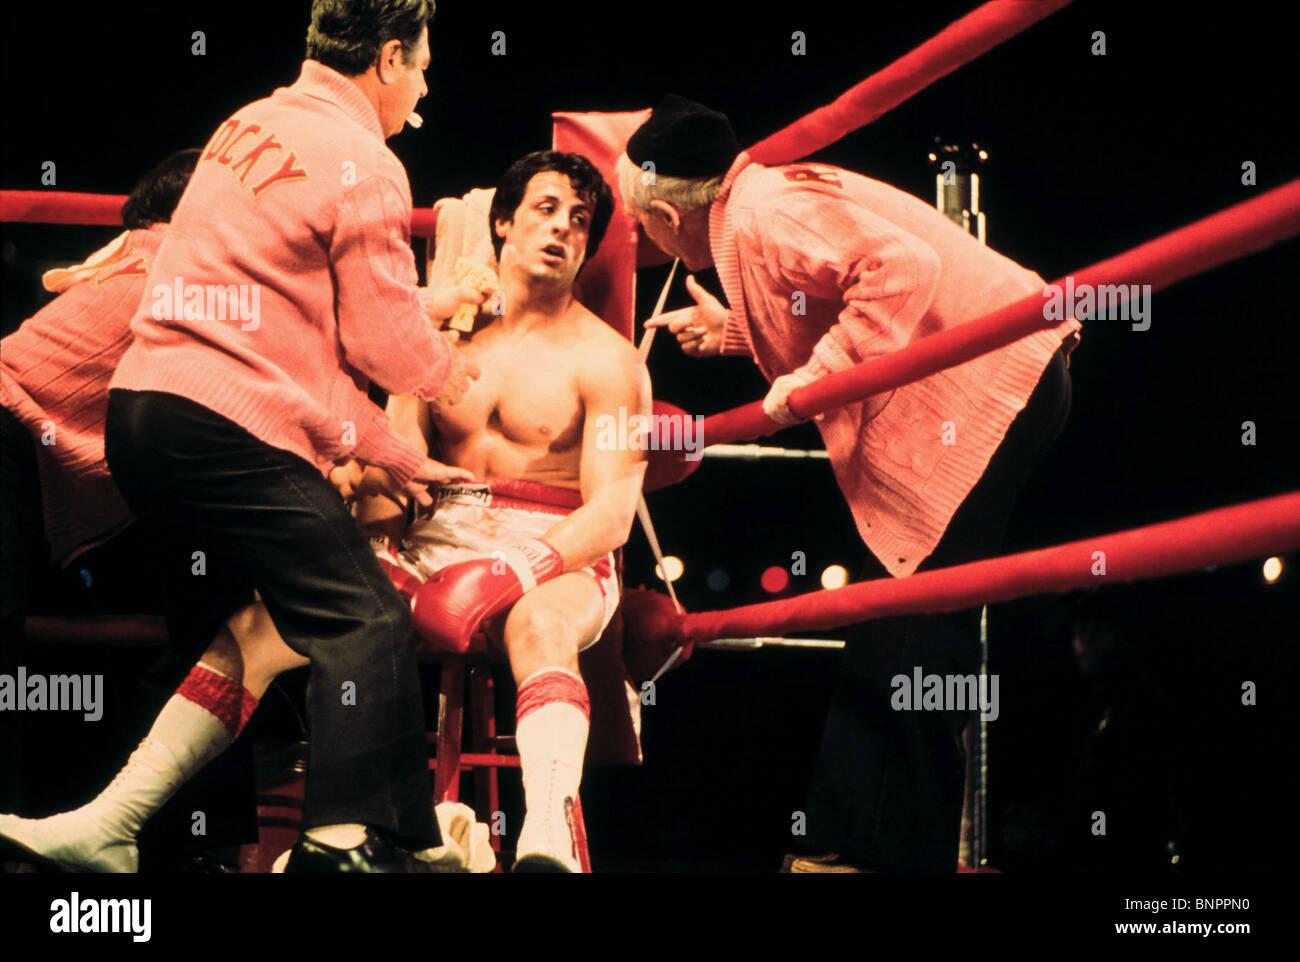 SYLVESTER STALLONE ROCKY (1976) - Stock Image